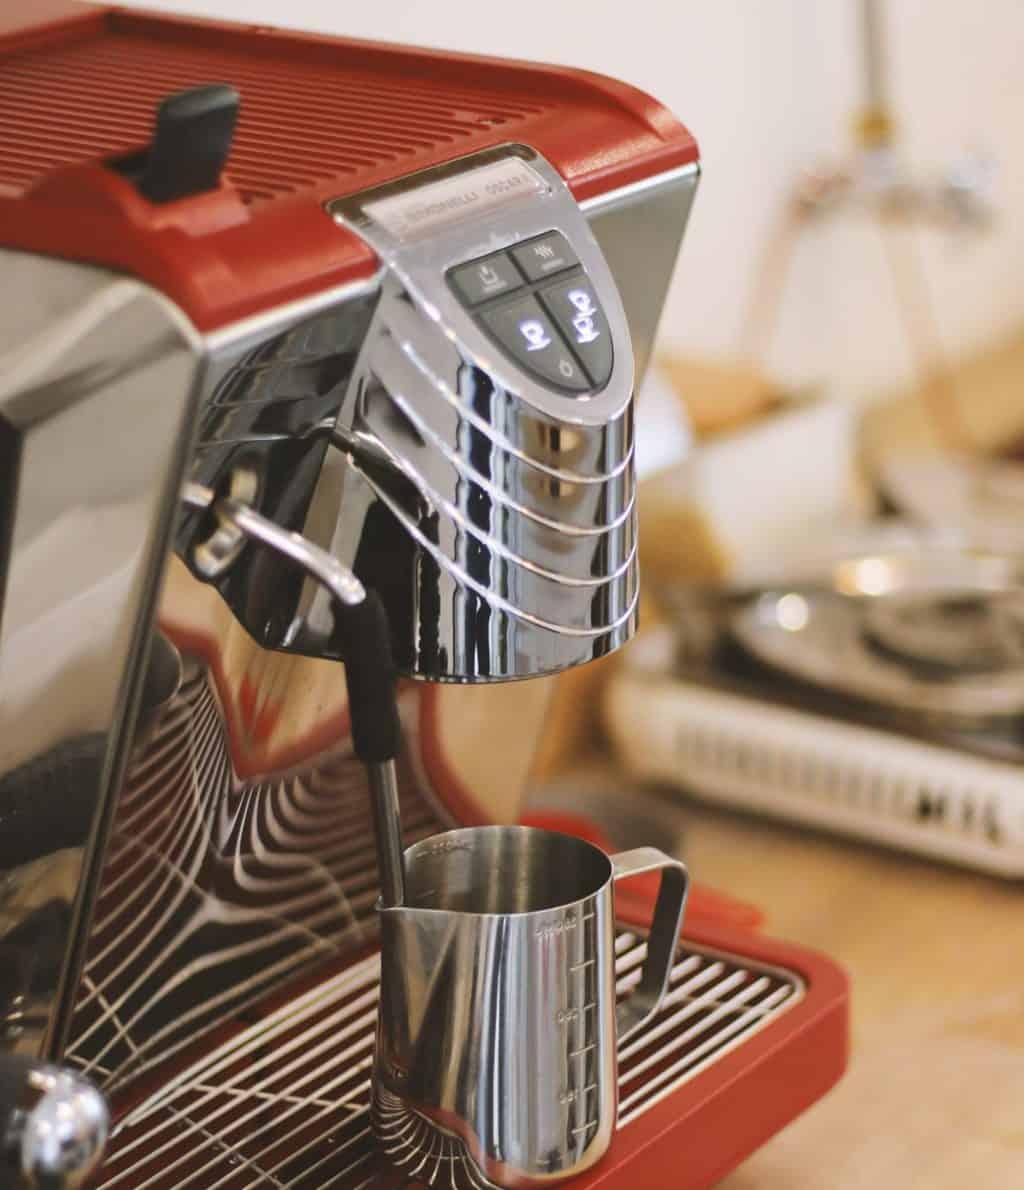 De'Longhi Italian Brand Coffee Machines